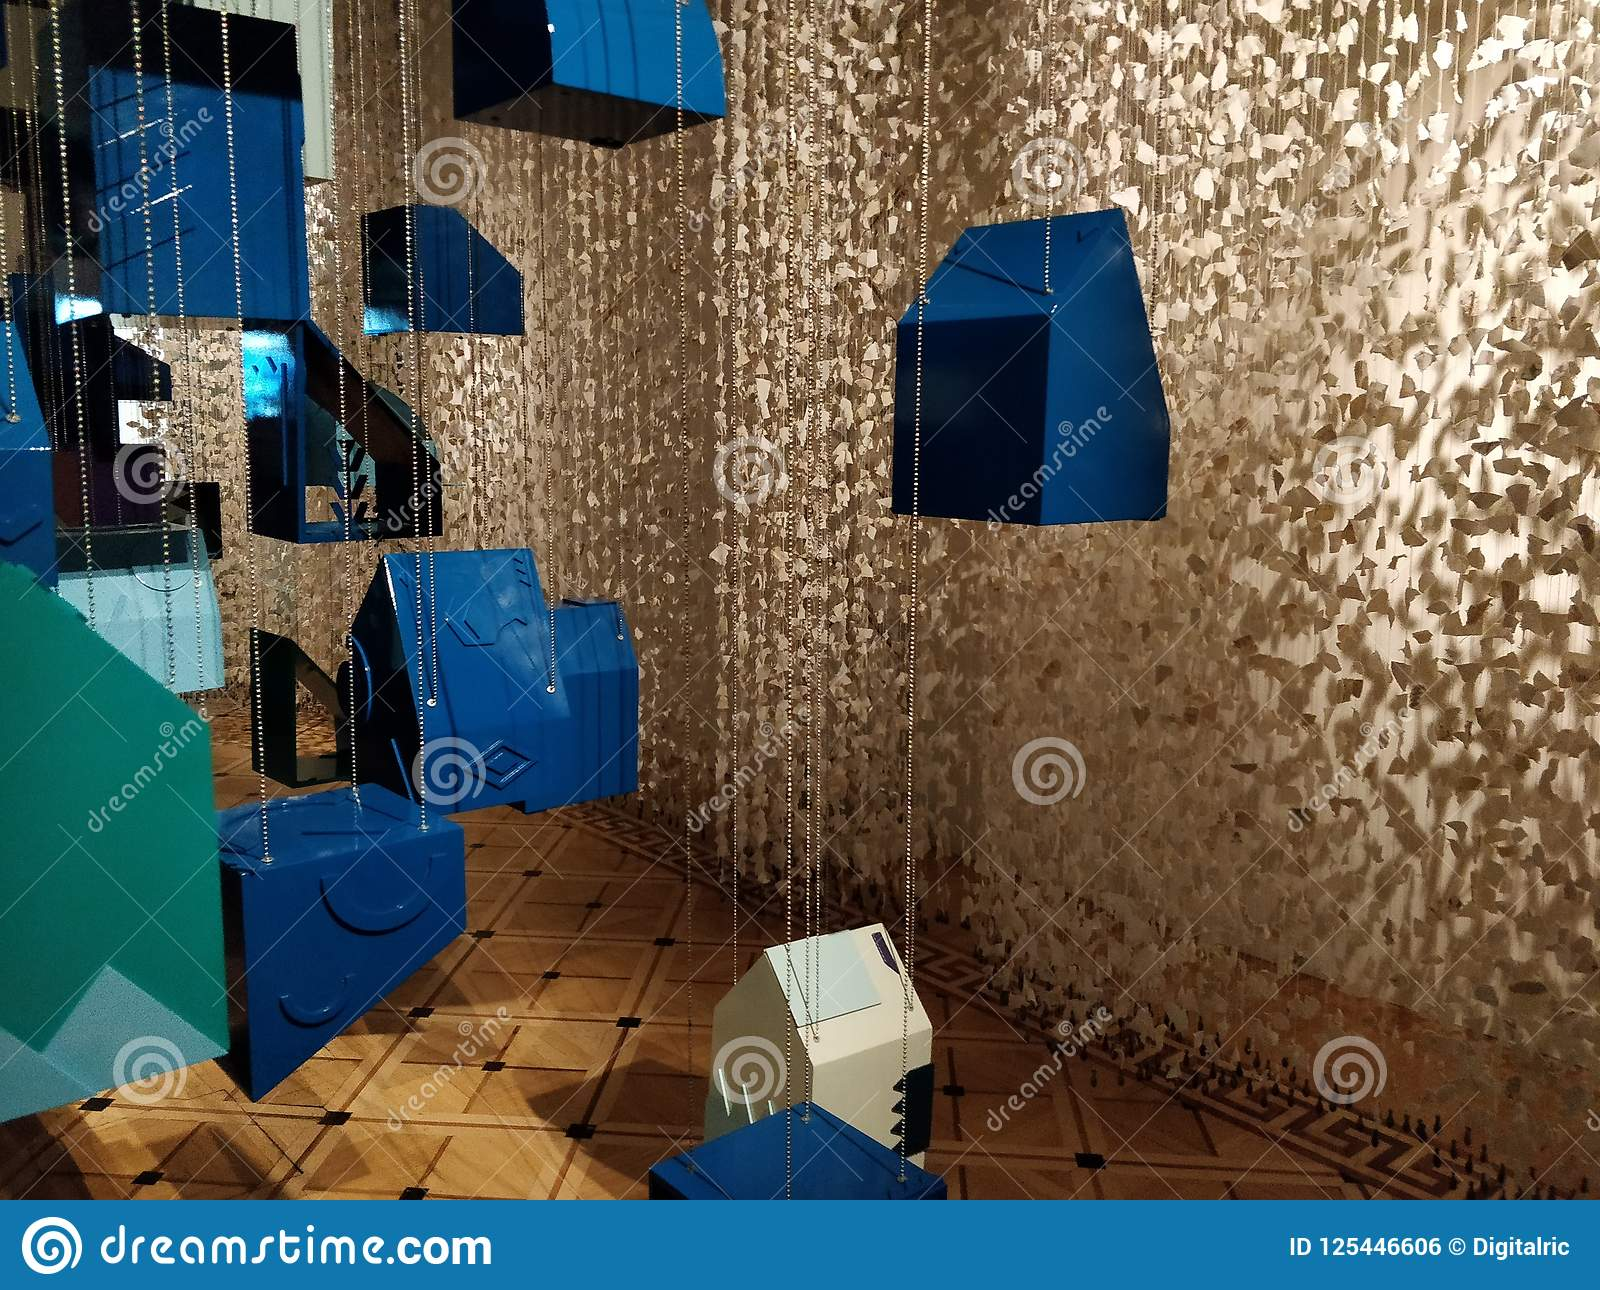 London Design Biennale 2018 Editorial Photo - Image of ...